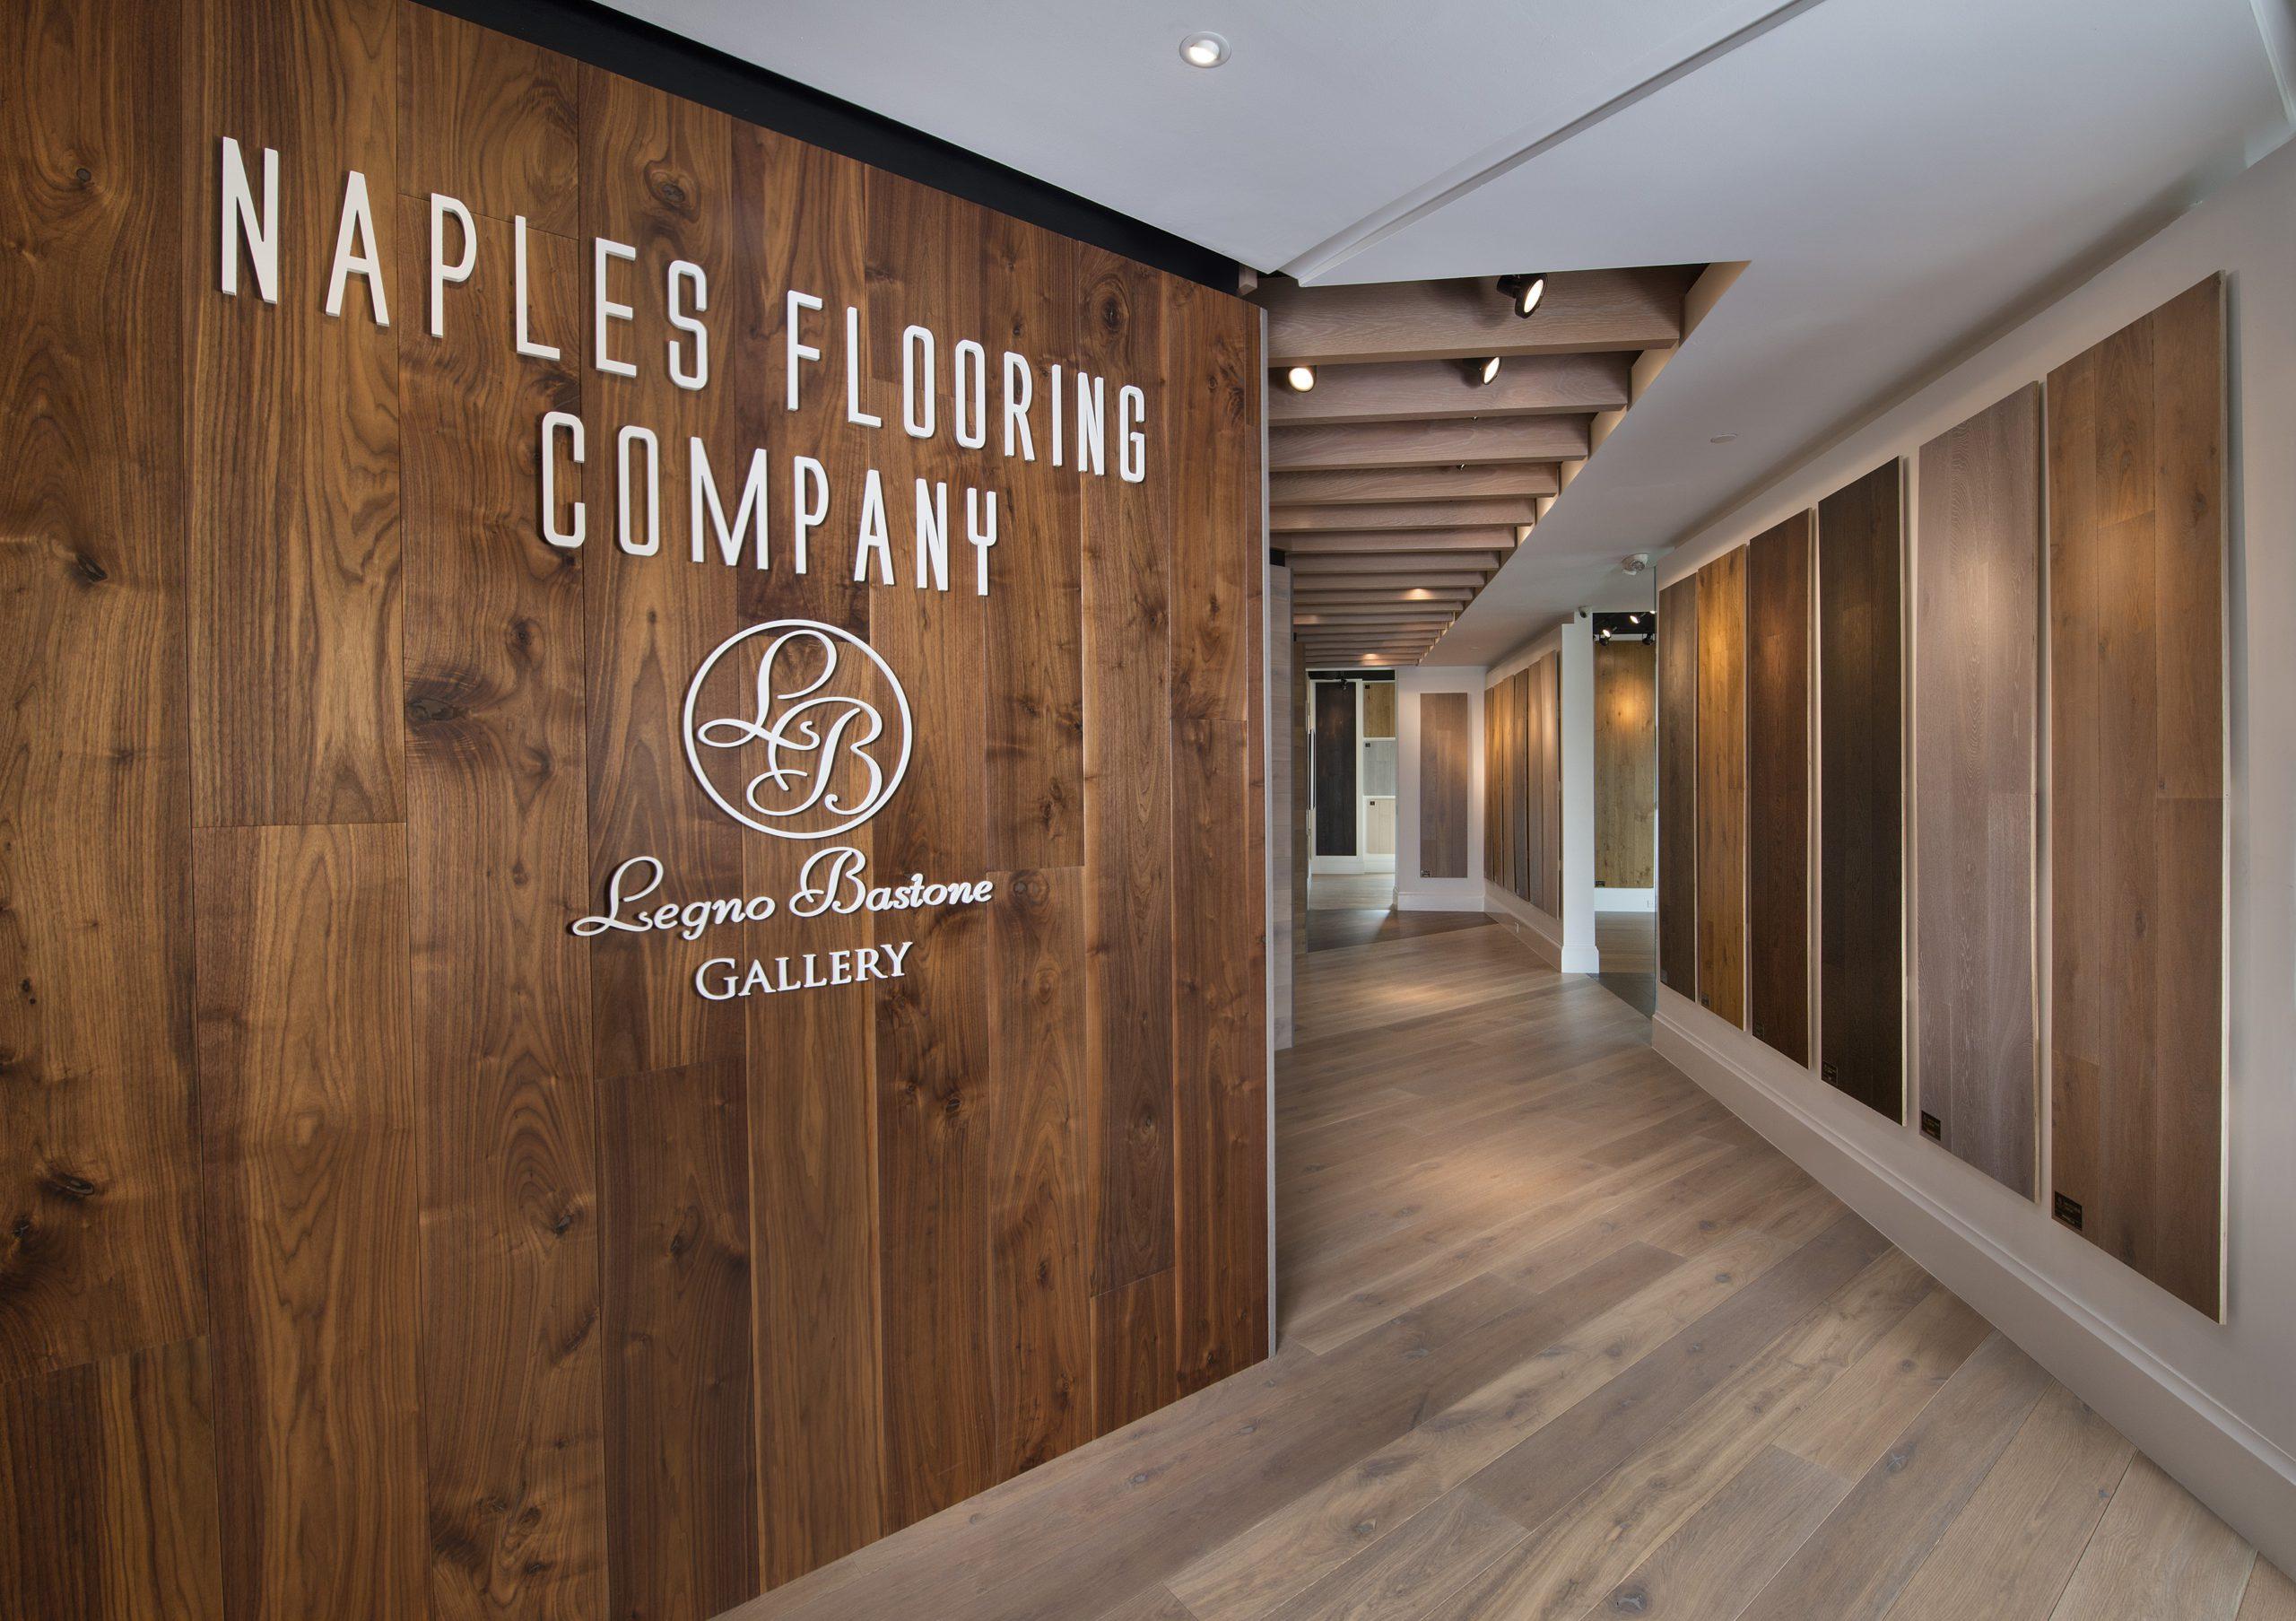 La Famiglia | Naples Flooring Company